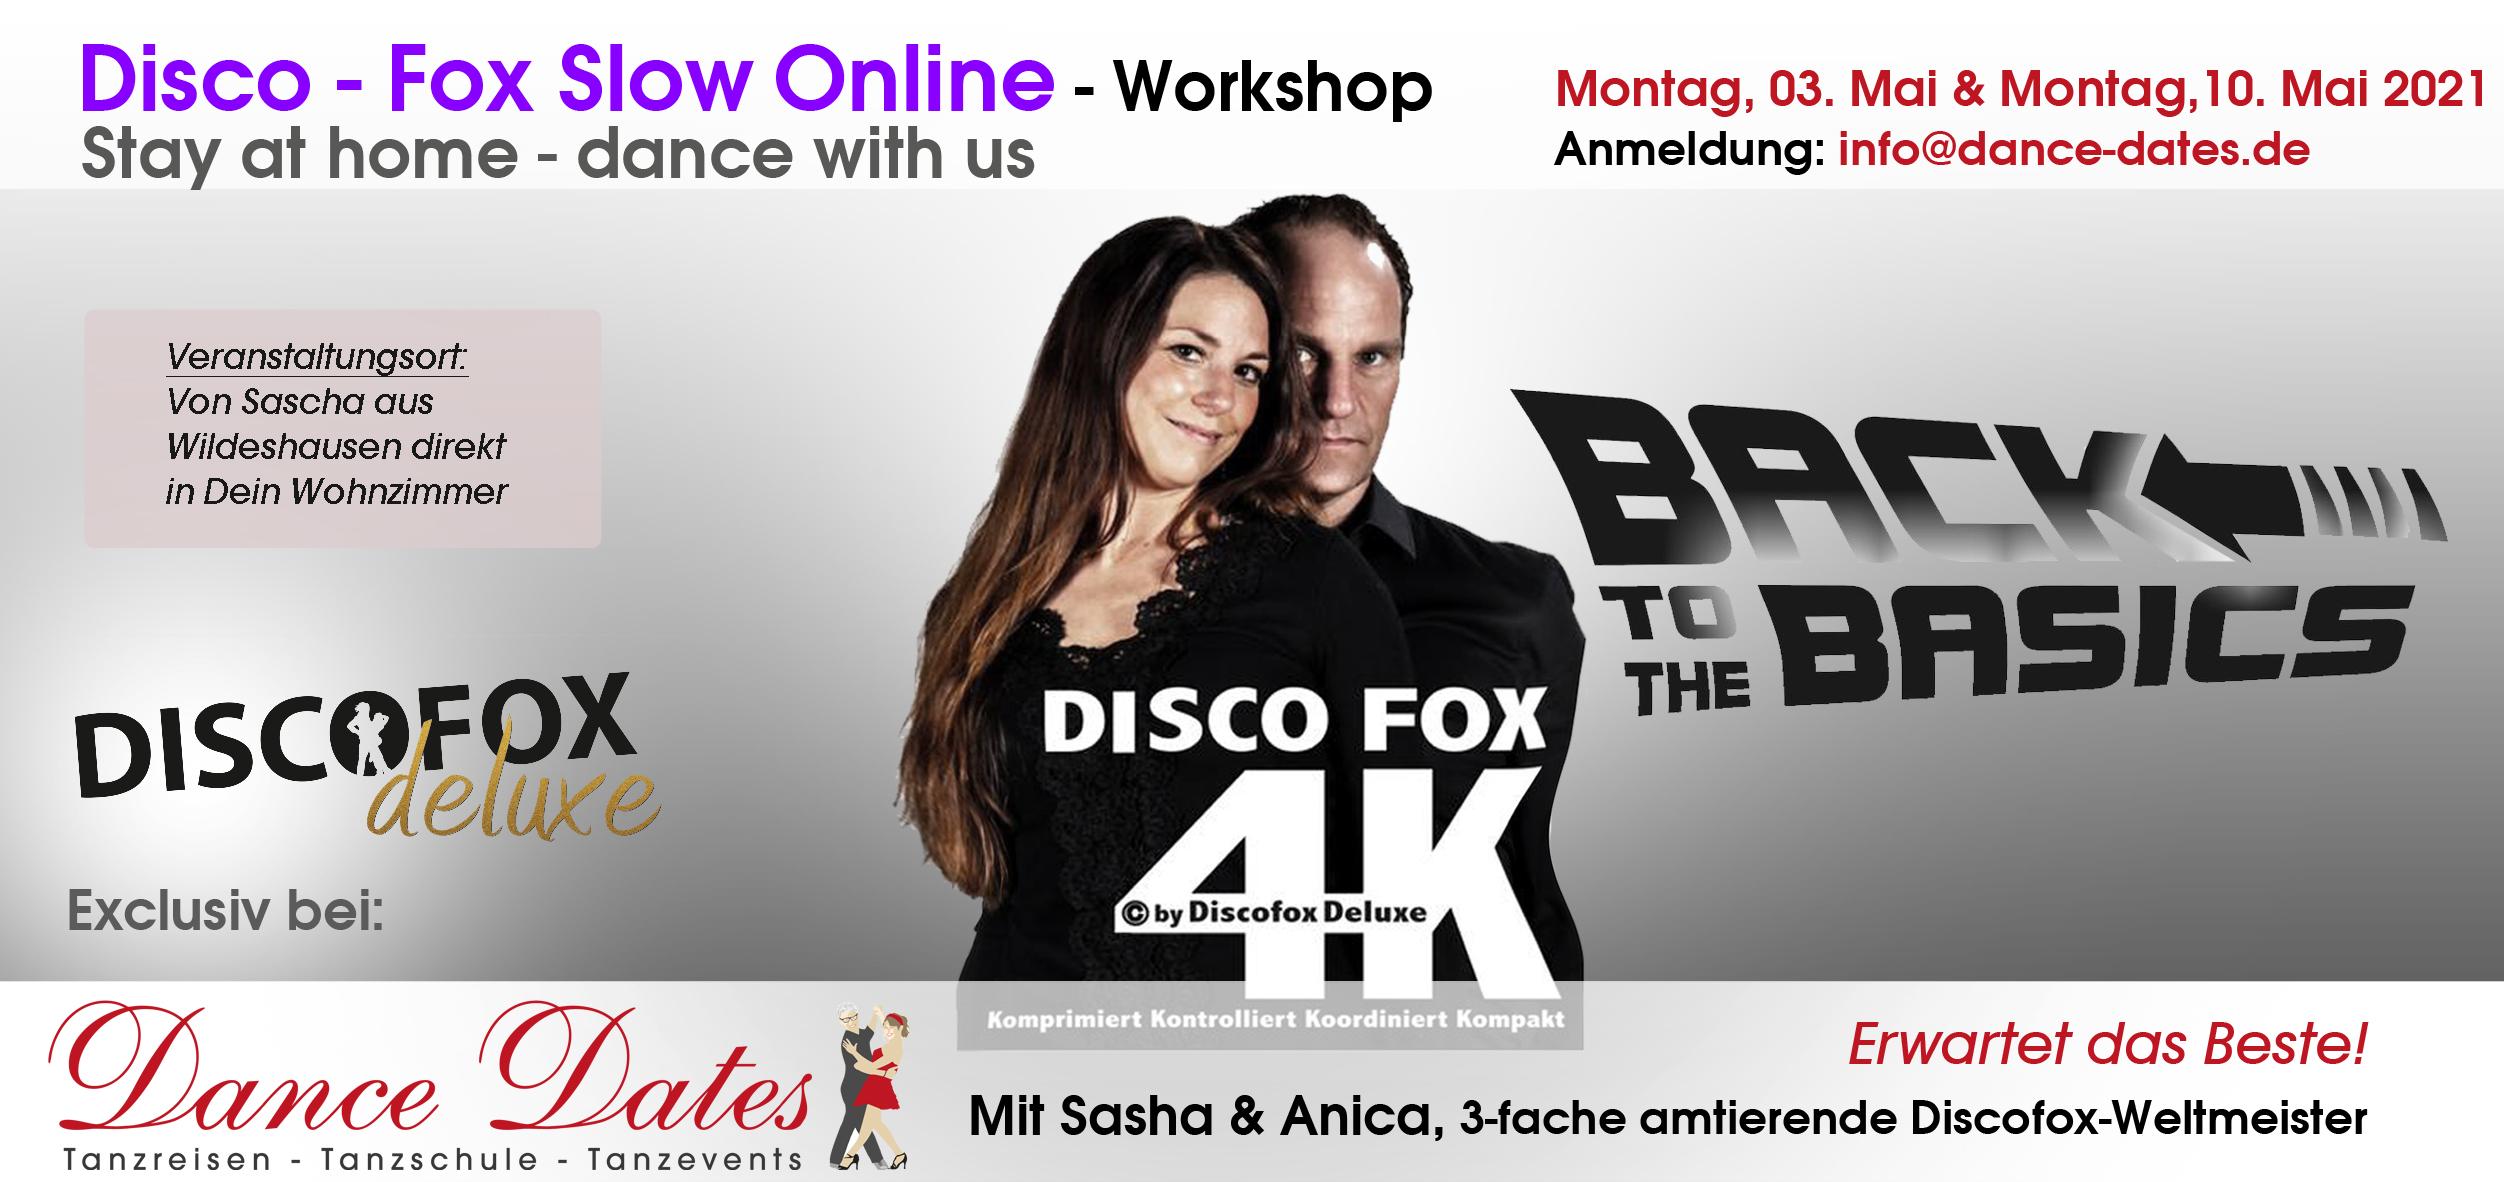 Discofox Deluxe Online-Tanzkurse - Back to the Basics